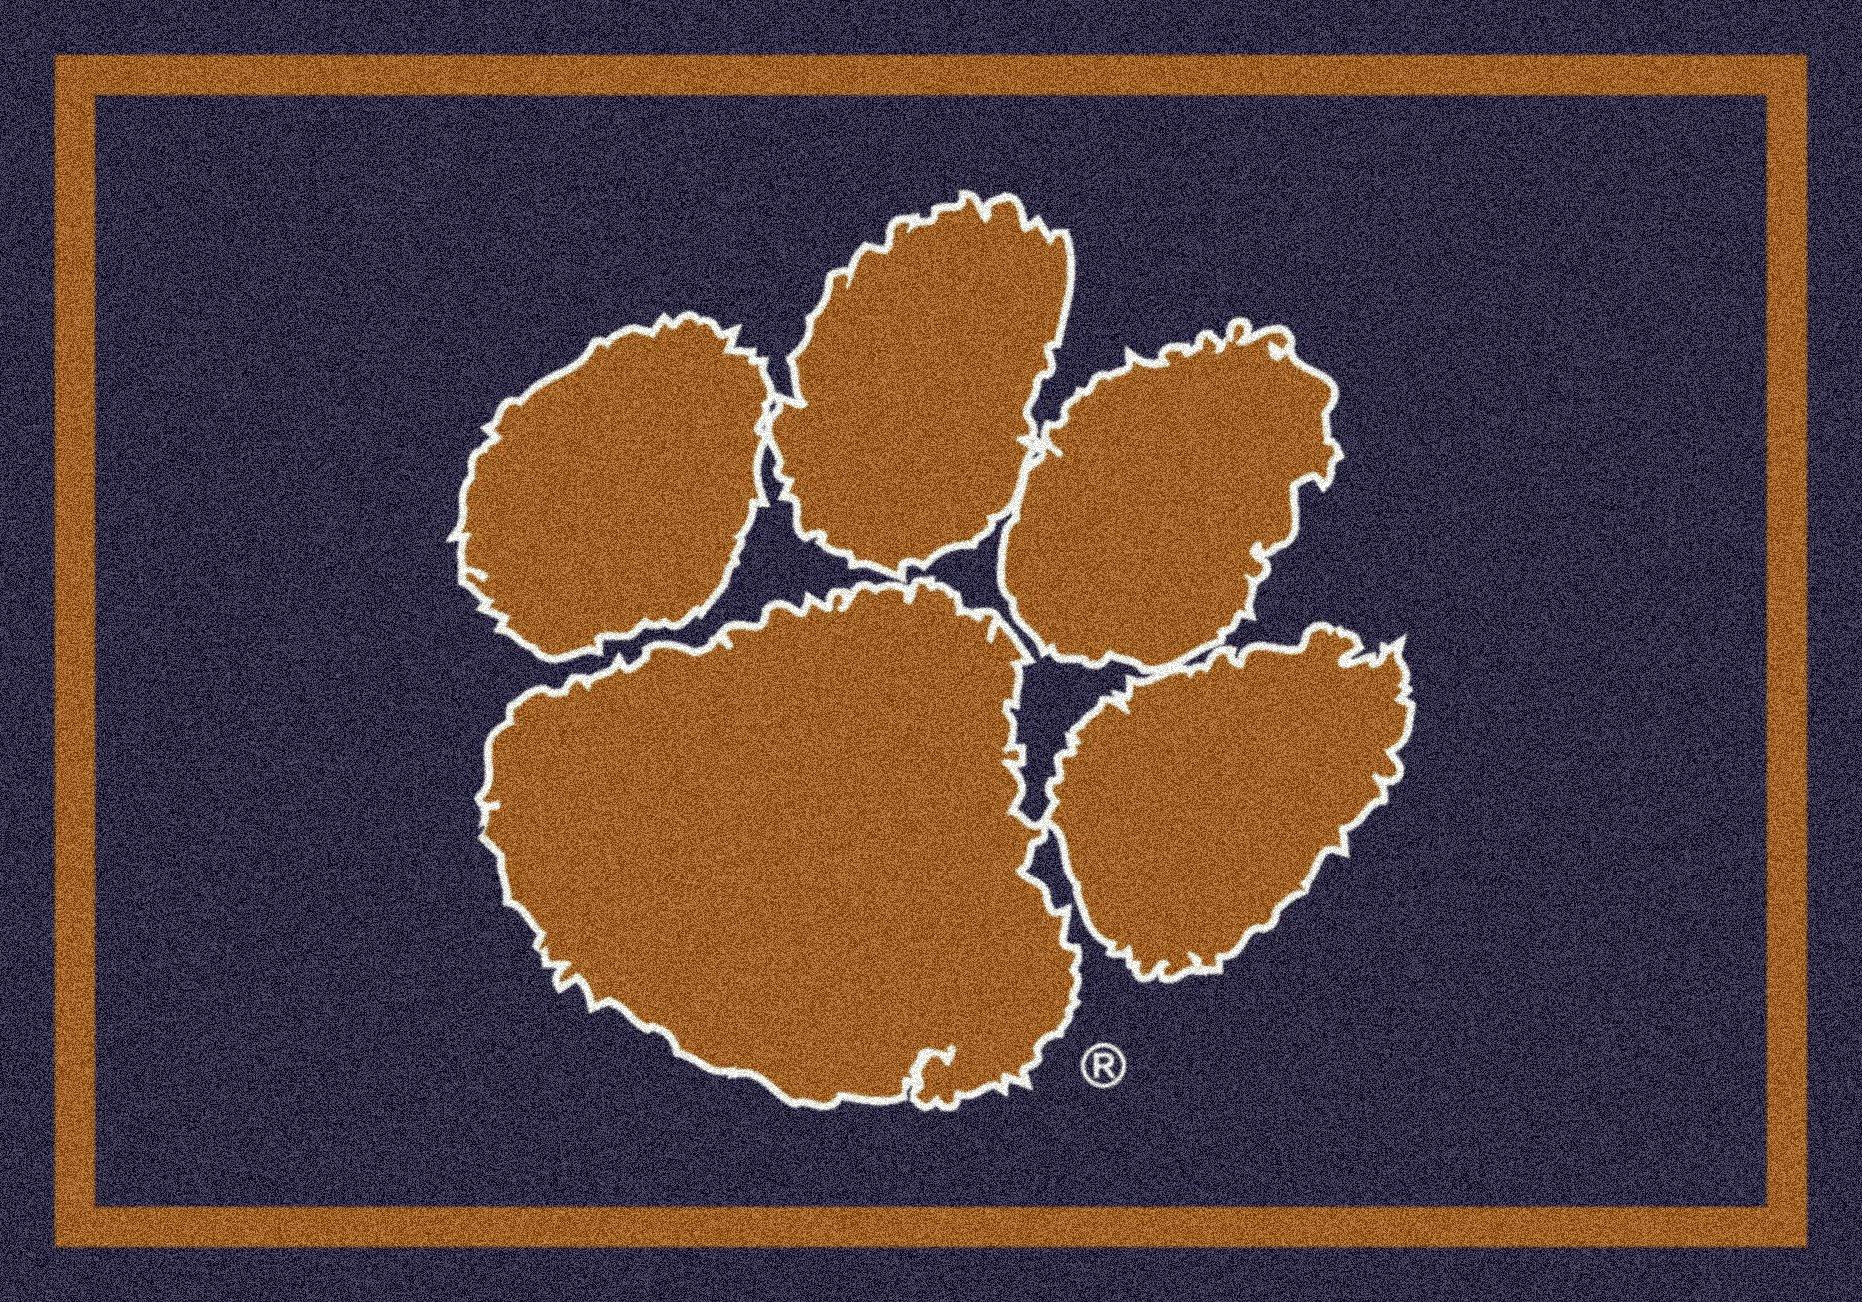 Clemson Tigers NCAA College Team Spirit Team Area Rug 2'8''x3'10''